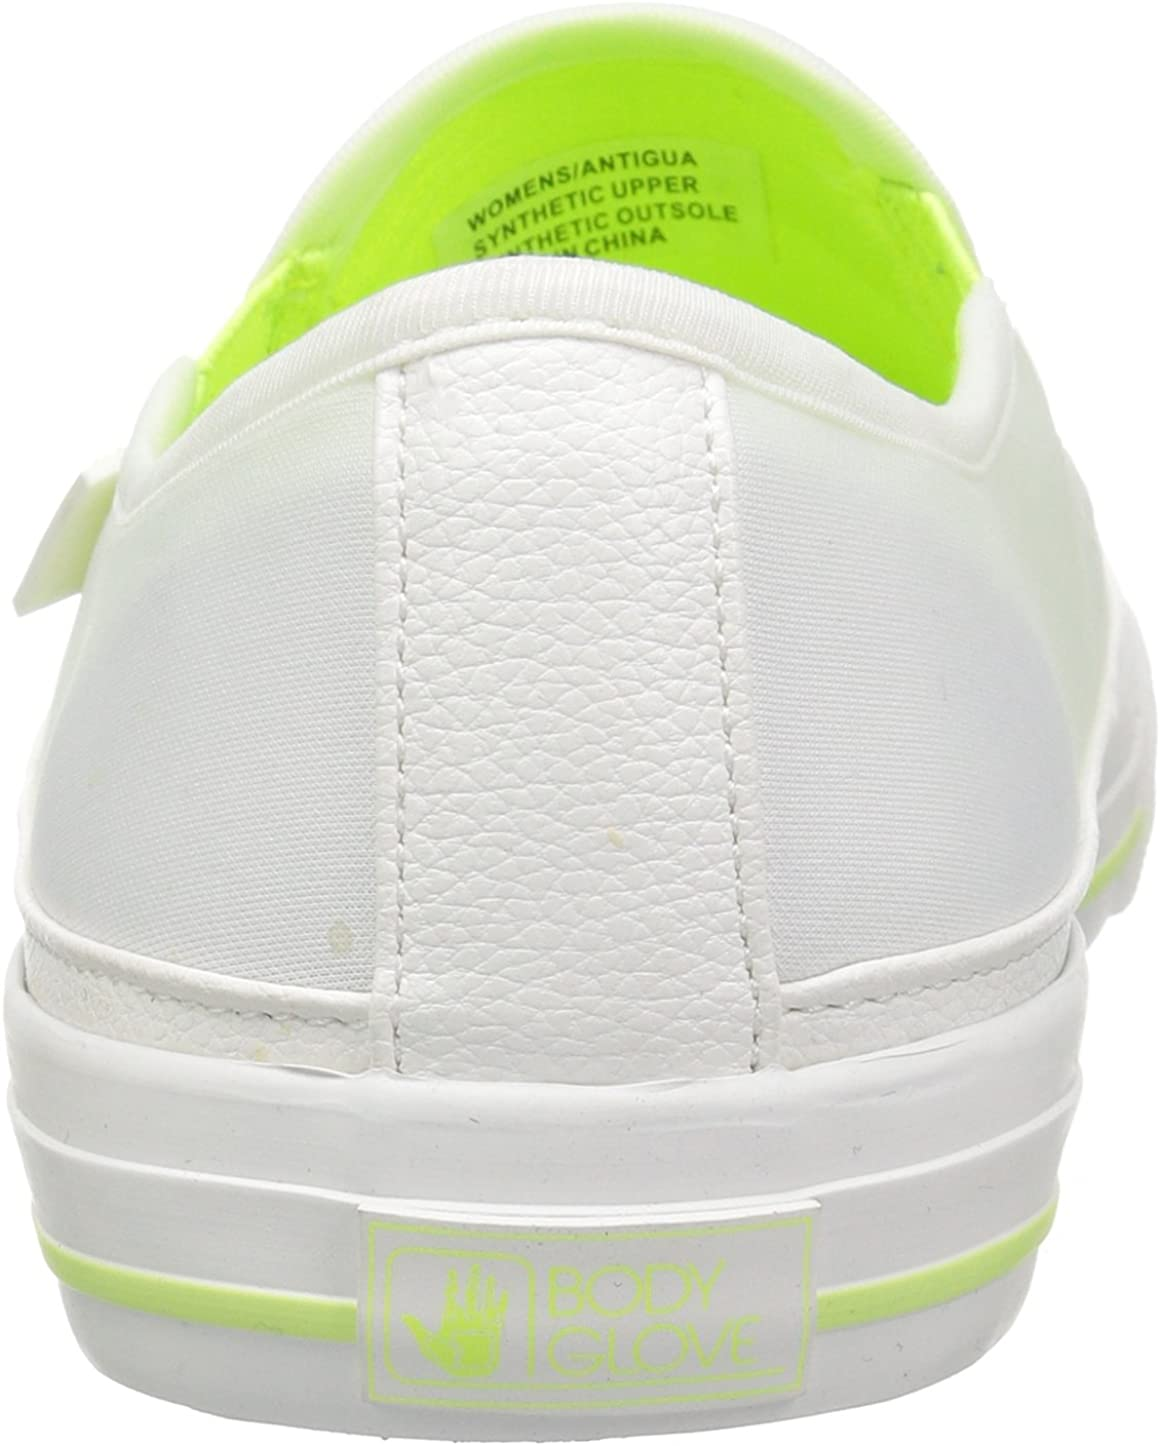 Body Glove Women's Antigua Sneaker White